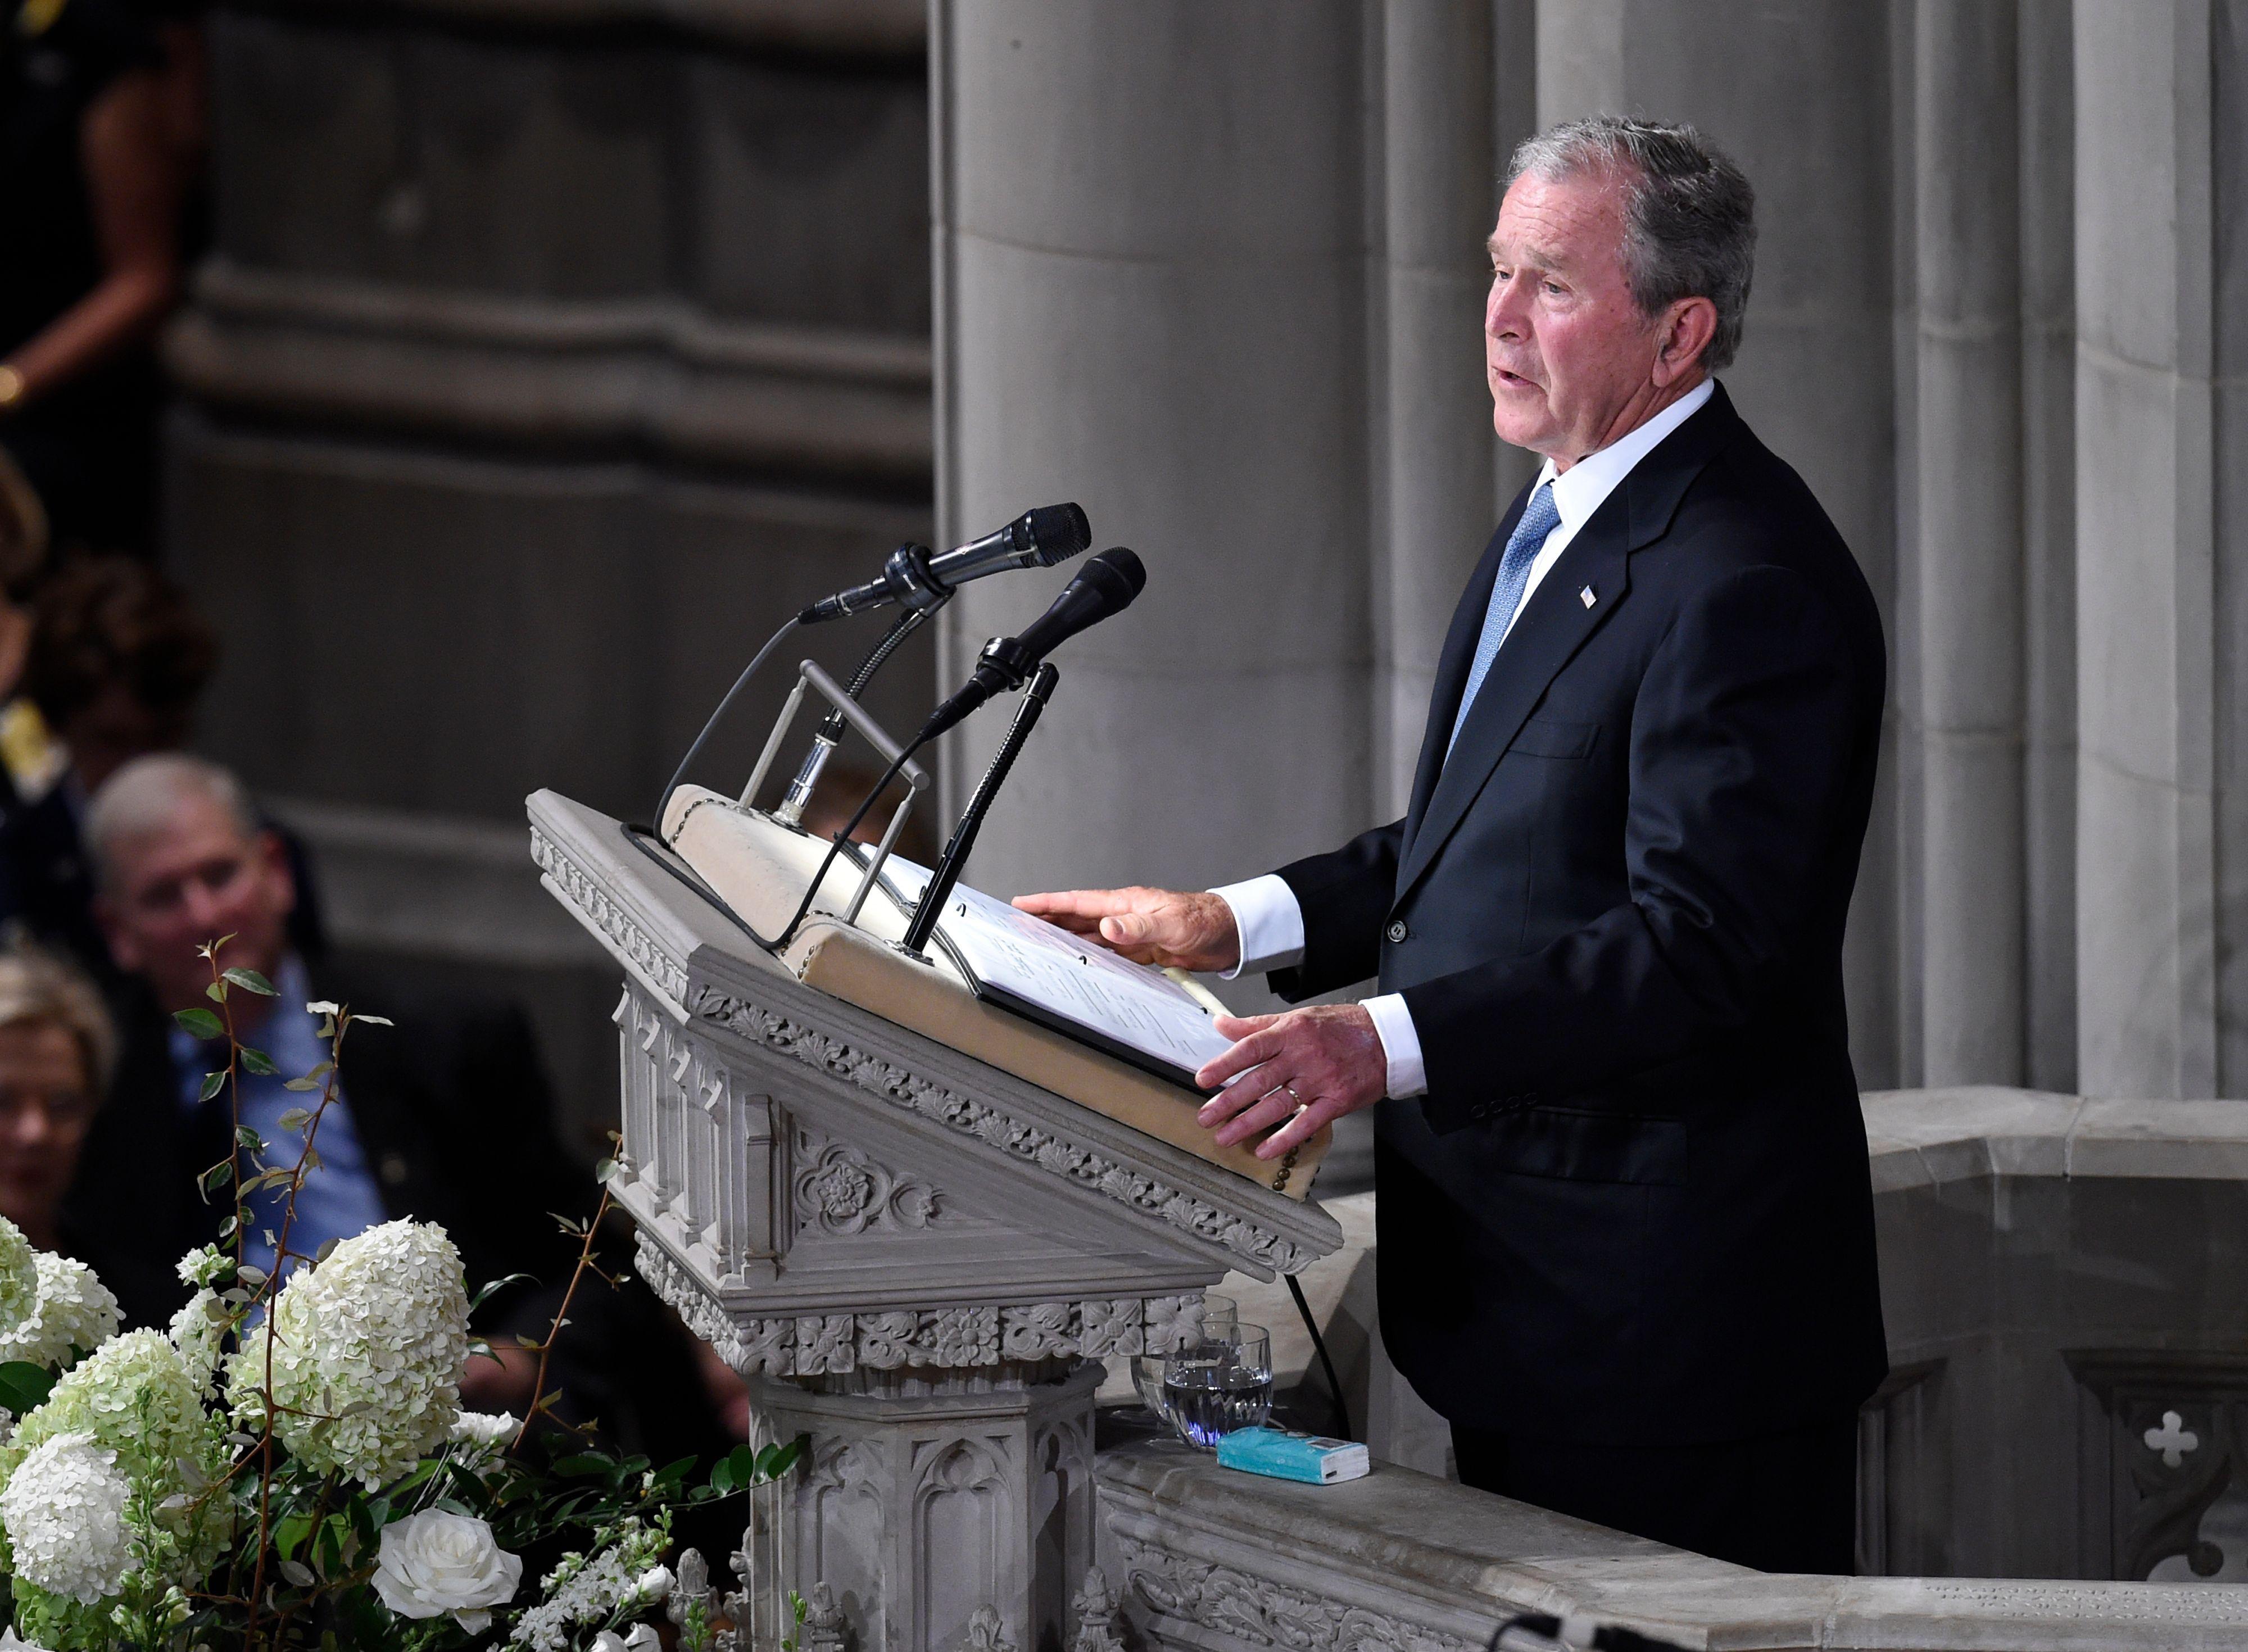 What George Bush And John Mccain Said >> George W Bush S Eulogy At John Mccain S Memorial Full Transcript